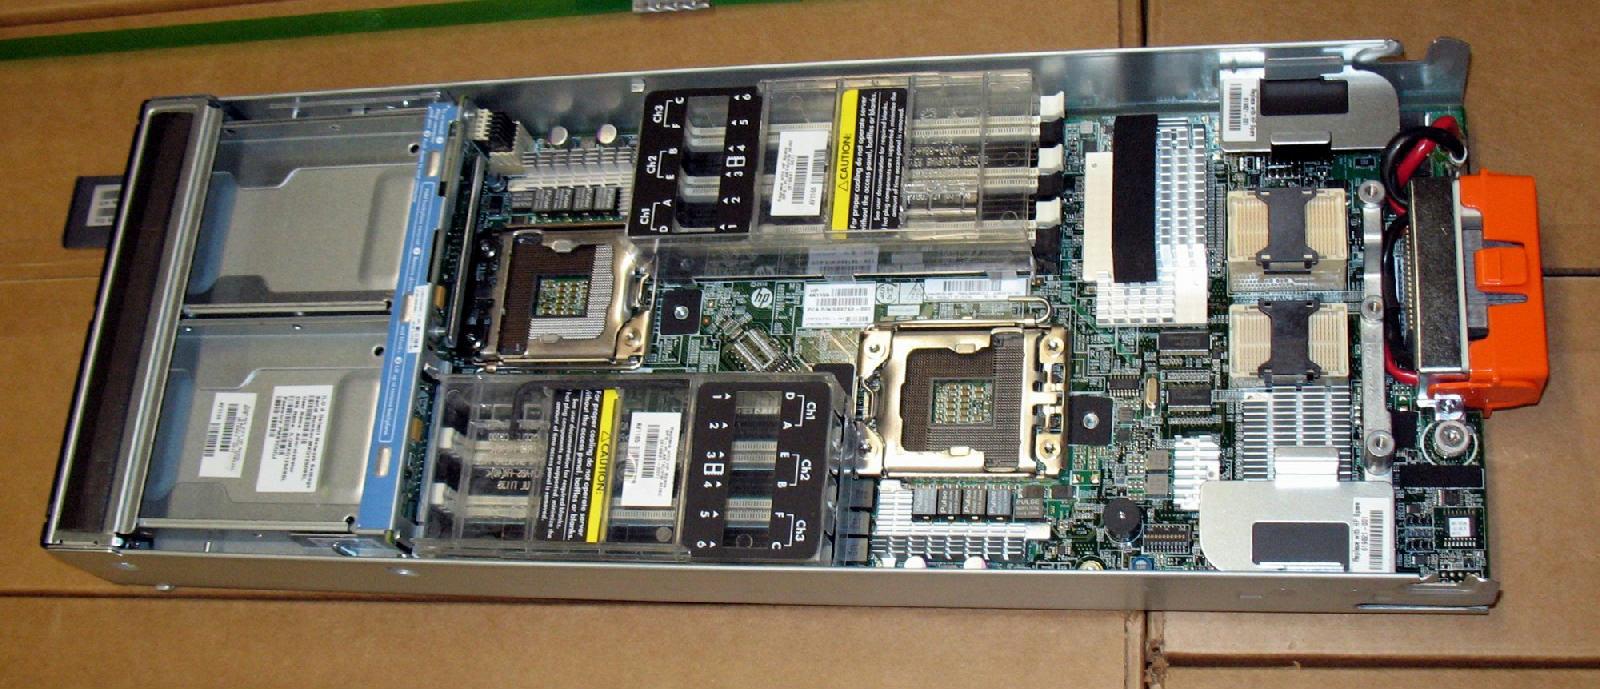 Hp Proliant Bl460c G7 Blade Server Cto Base Model Barebone